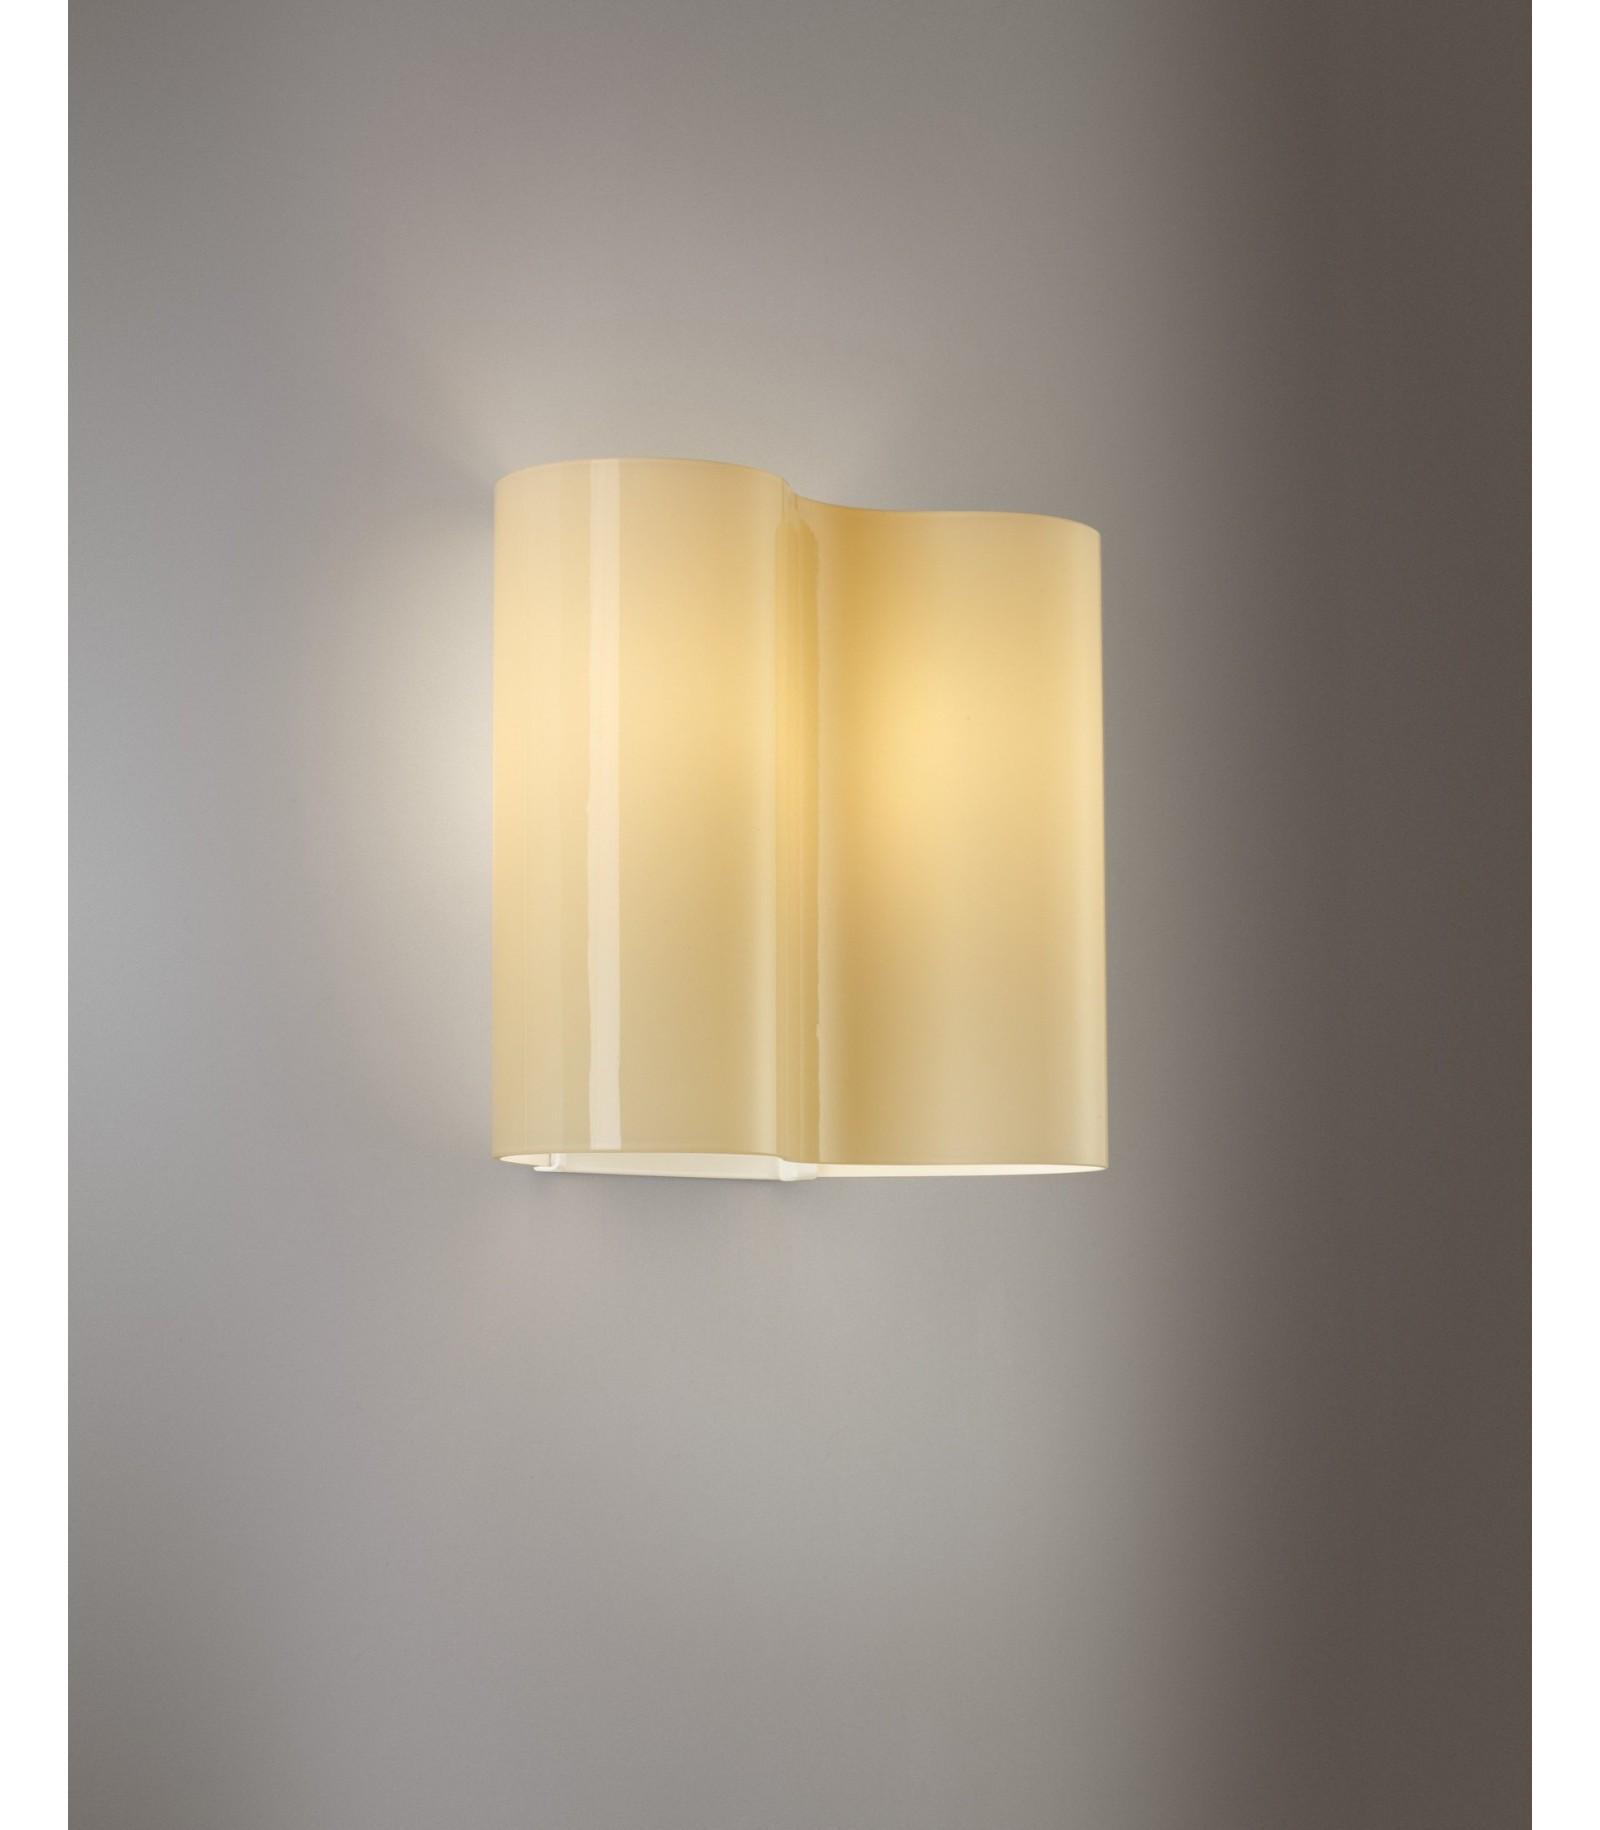 Lampada da parete foscarini double 07 - Lampada da parete design ...